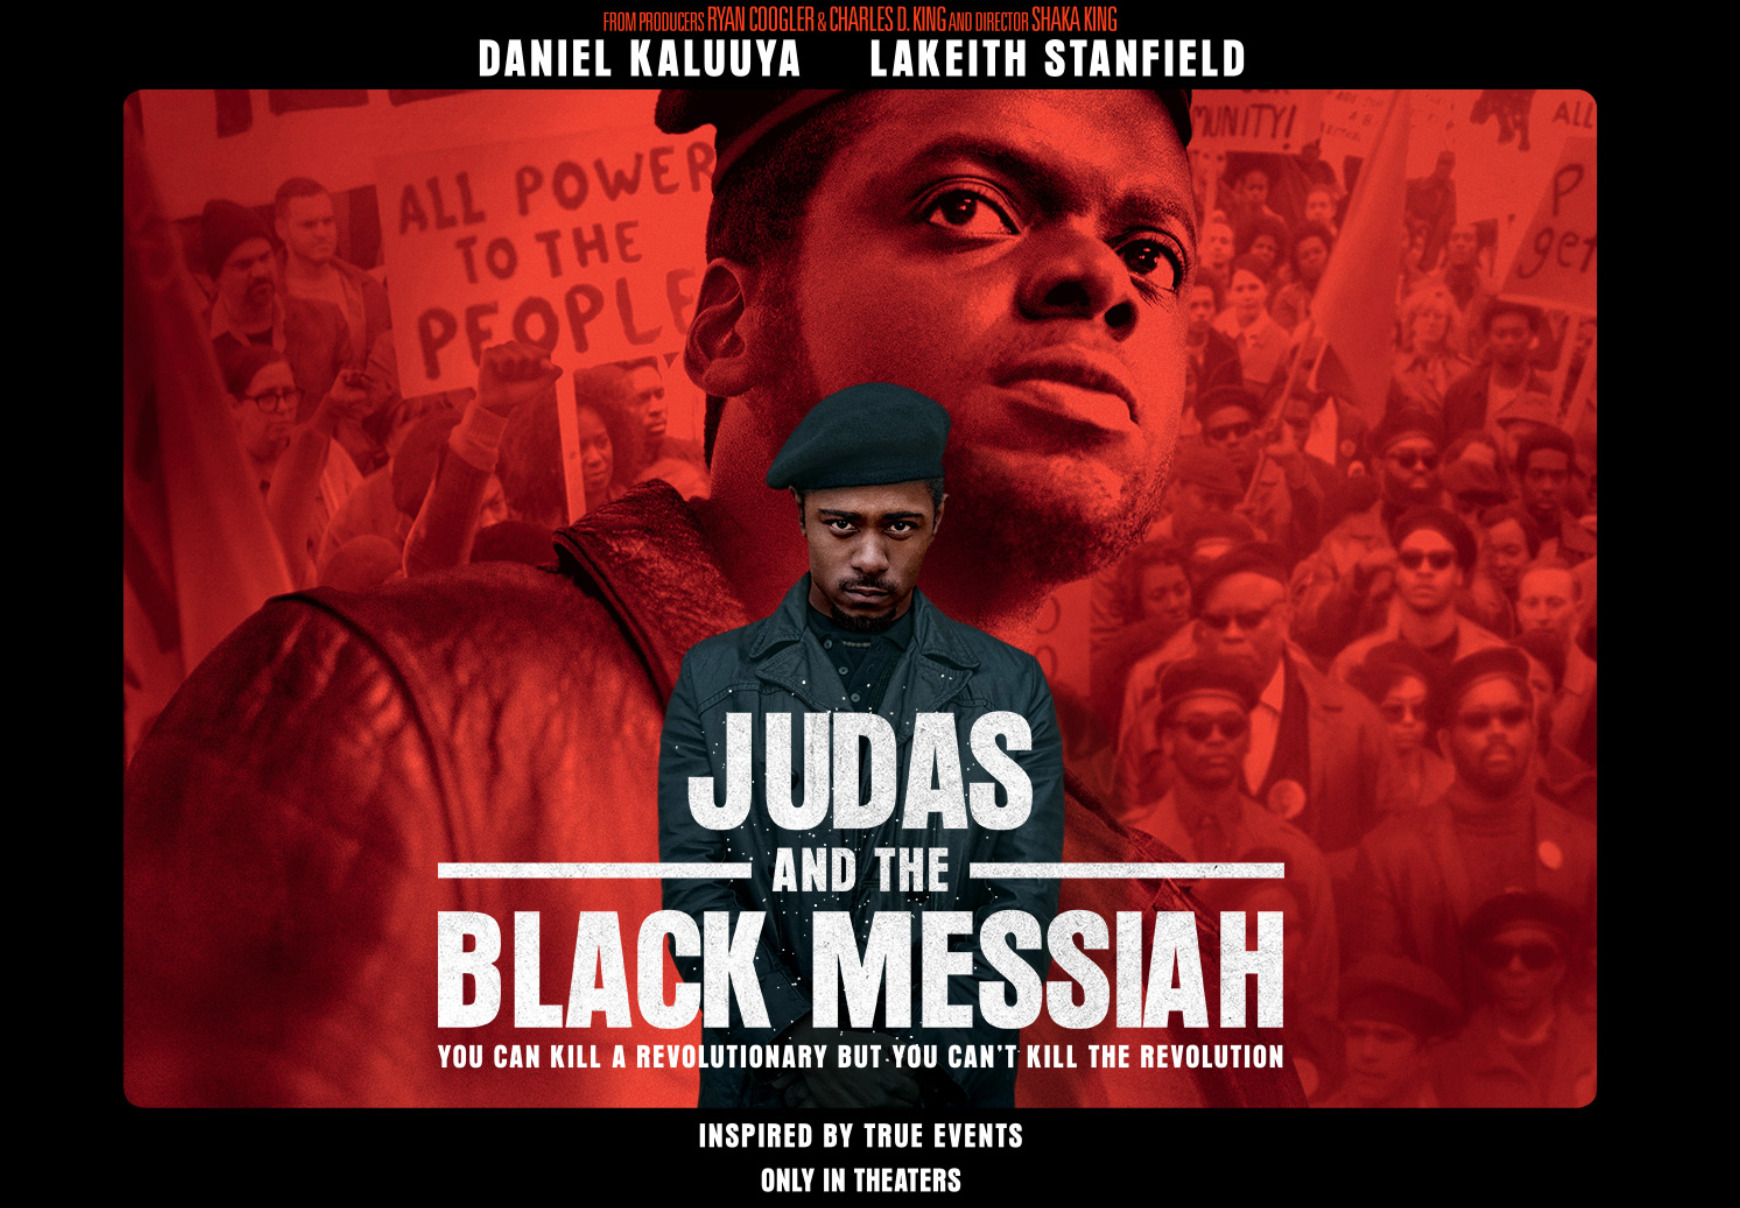 Judas and the Black Messiah / Daniel Kaluuya (Shaka King, 2021)